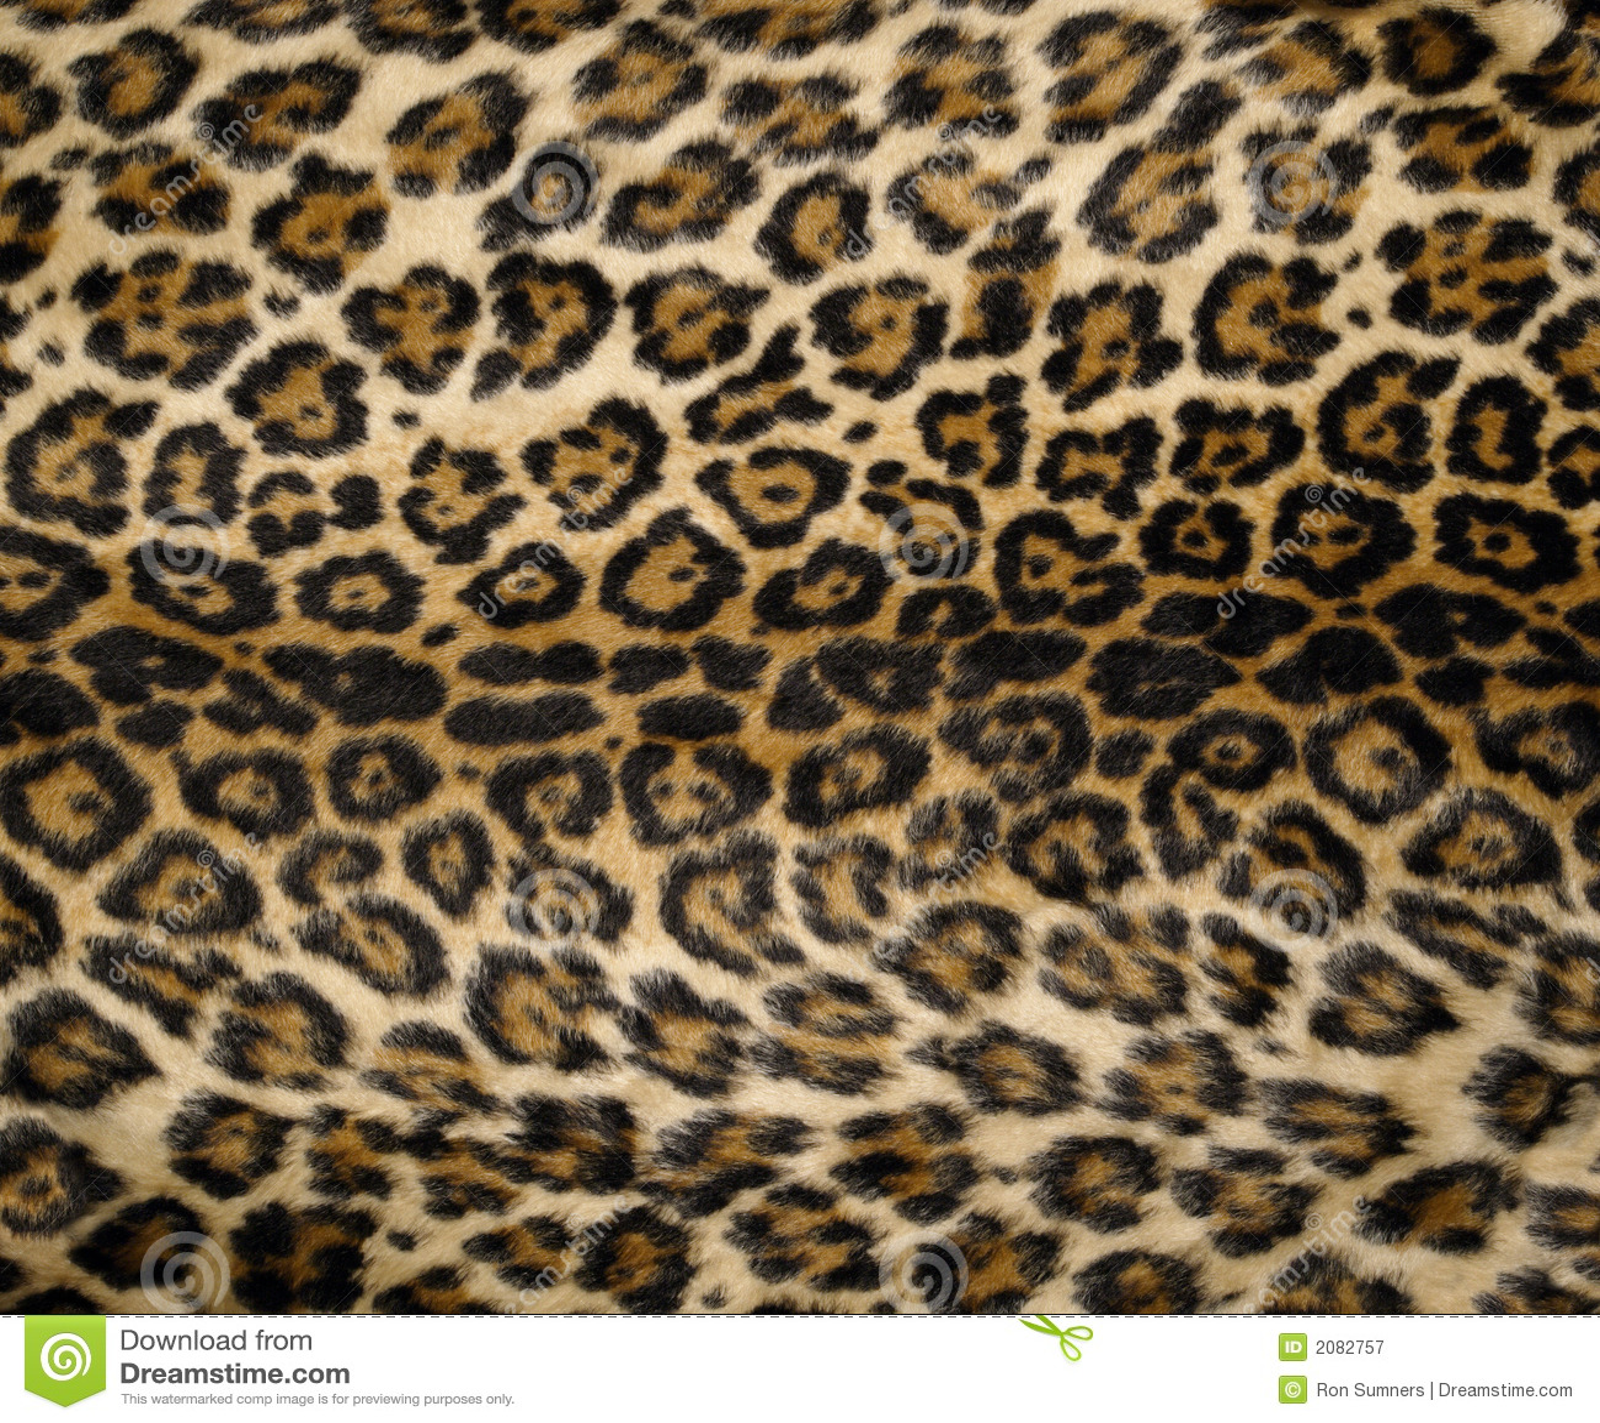 leopard pattern 2 print - photo #21